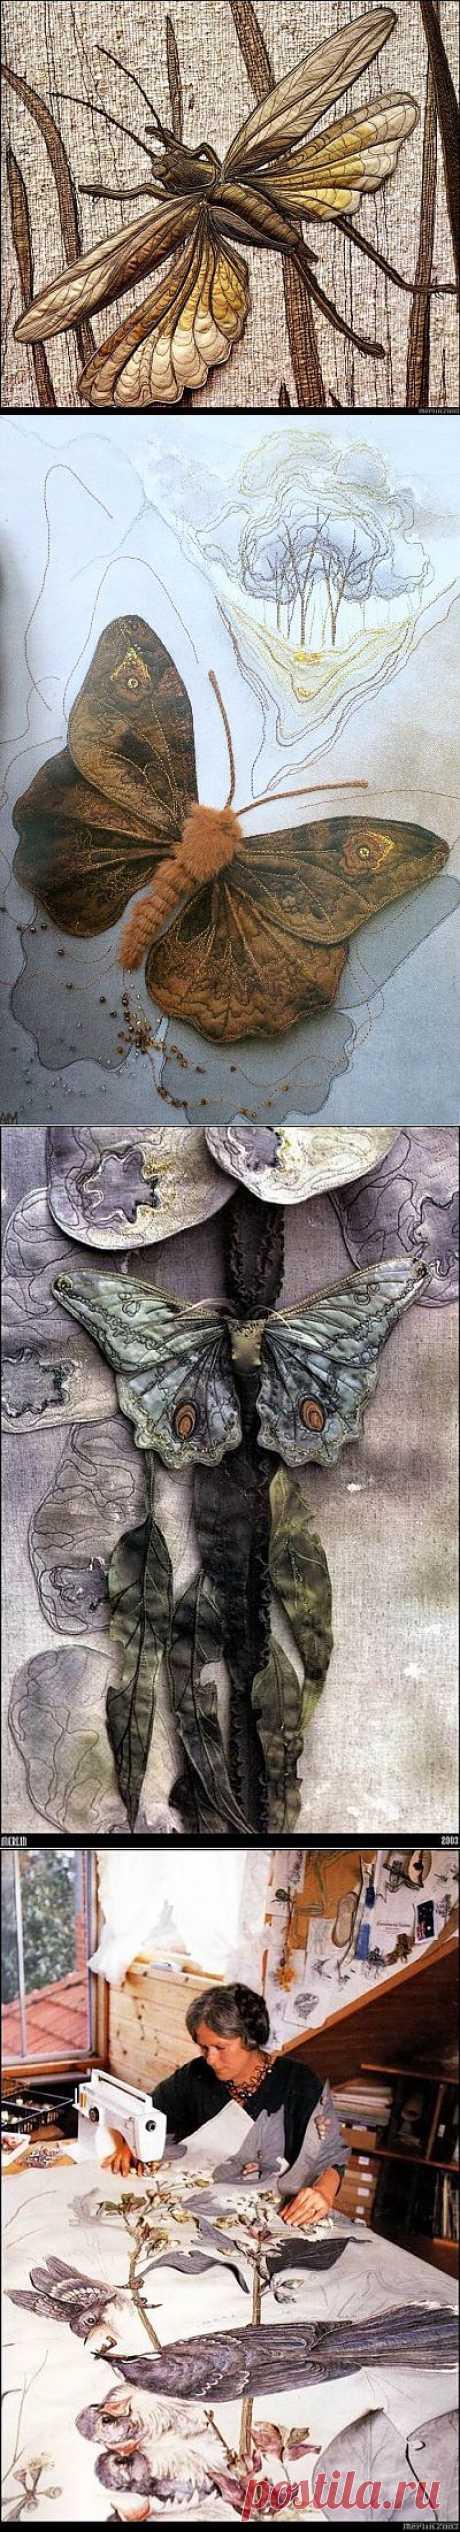 Картины Annemieke Mein (траффик) / Арт-объекты / ВТОРАЯ УЛИЦА